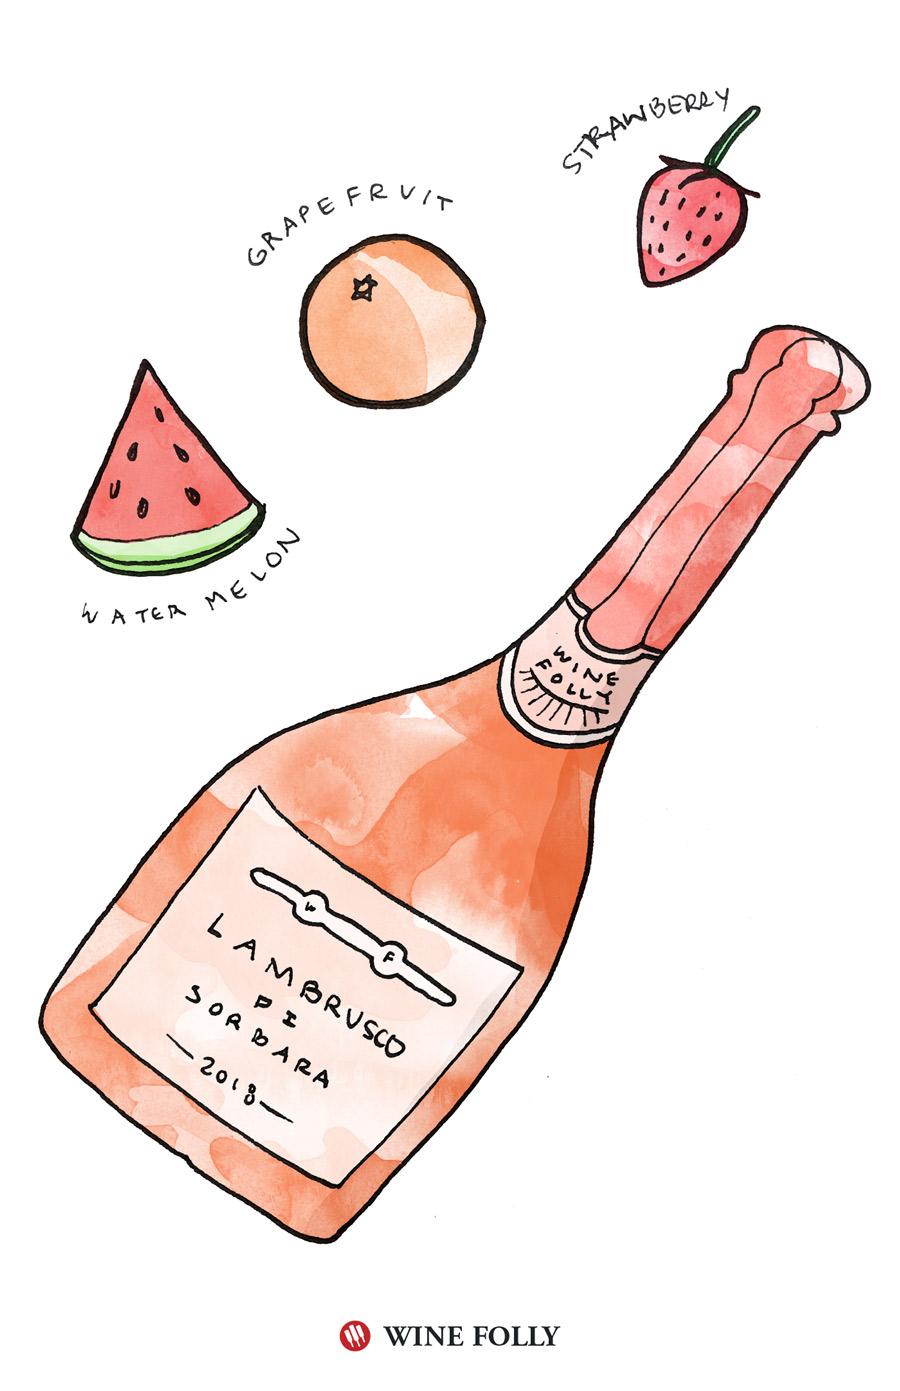 Lambrusco di Sorbara Recommendation Illustration by Wine Folly